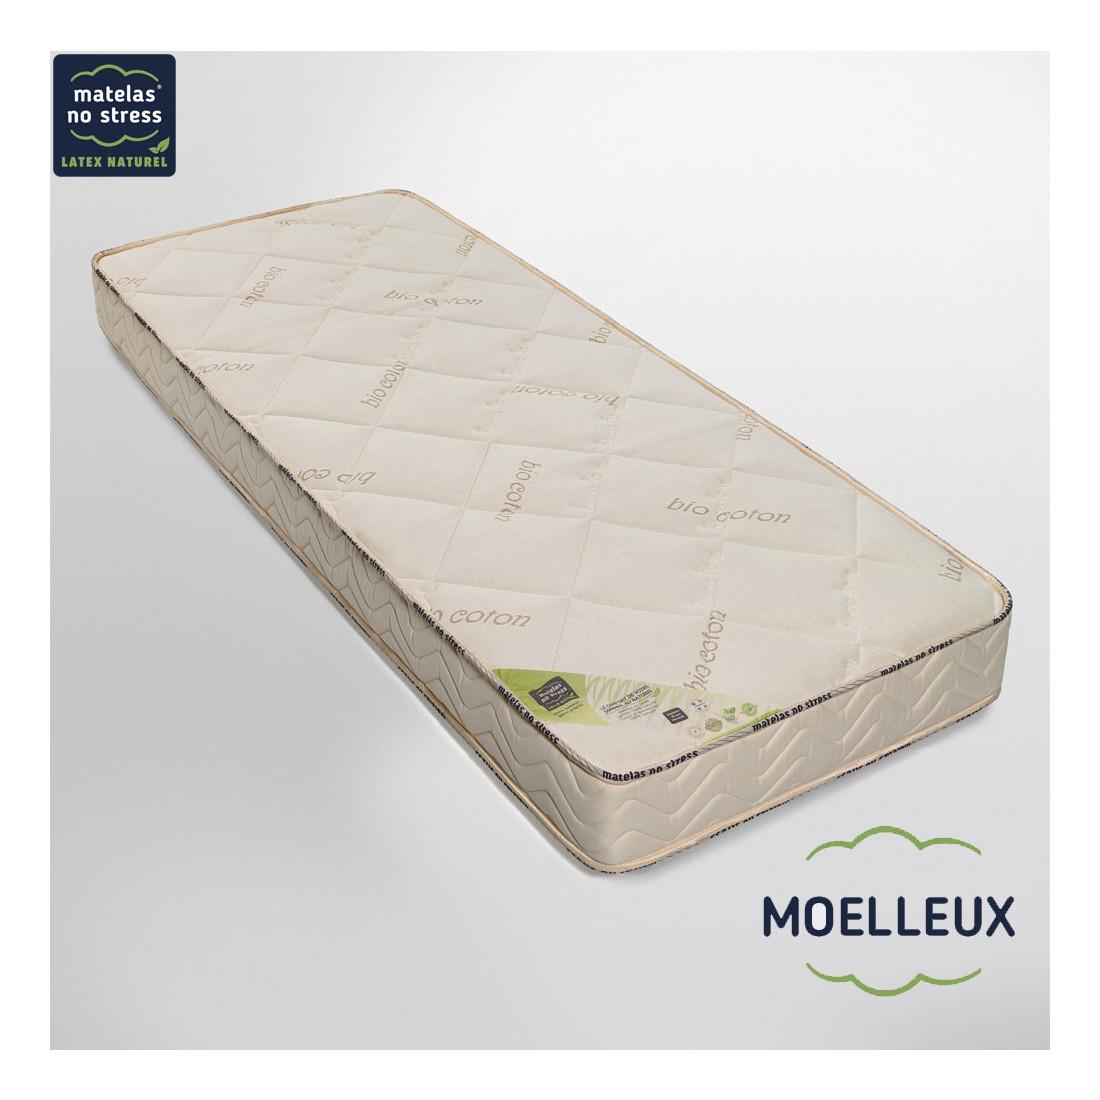 matelas moelleux 100x200 en latex naturel. Black Bedroom Furniture Sets. Home Design Ideas